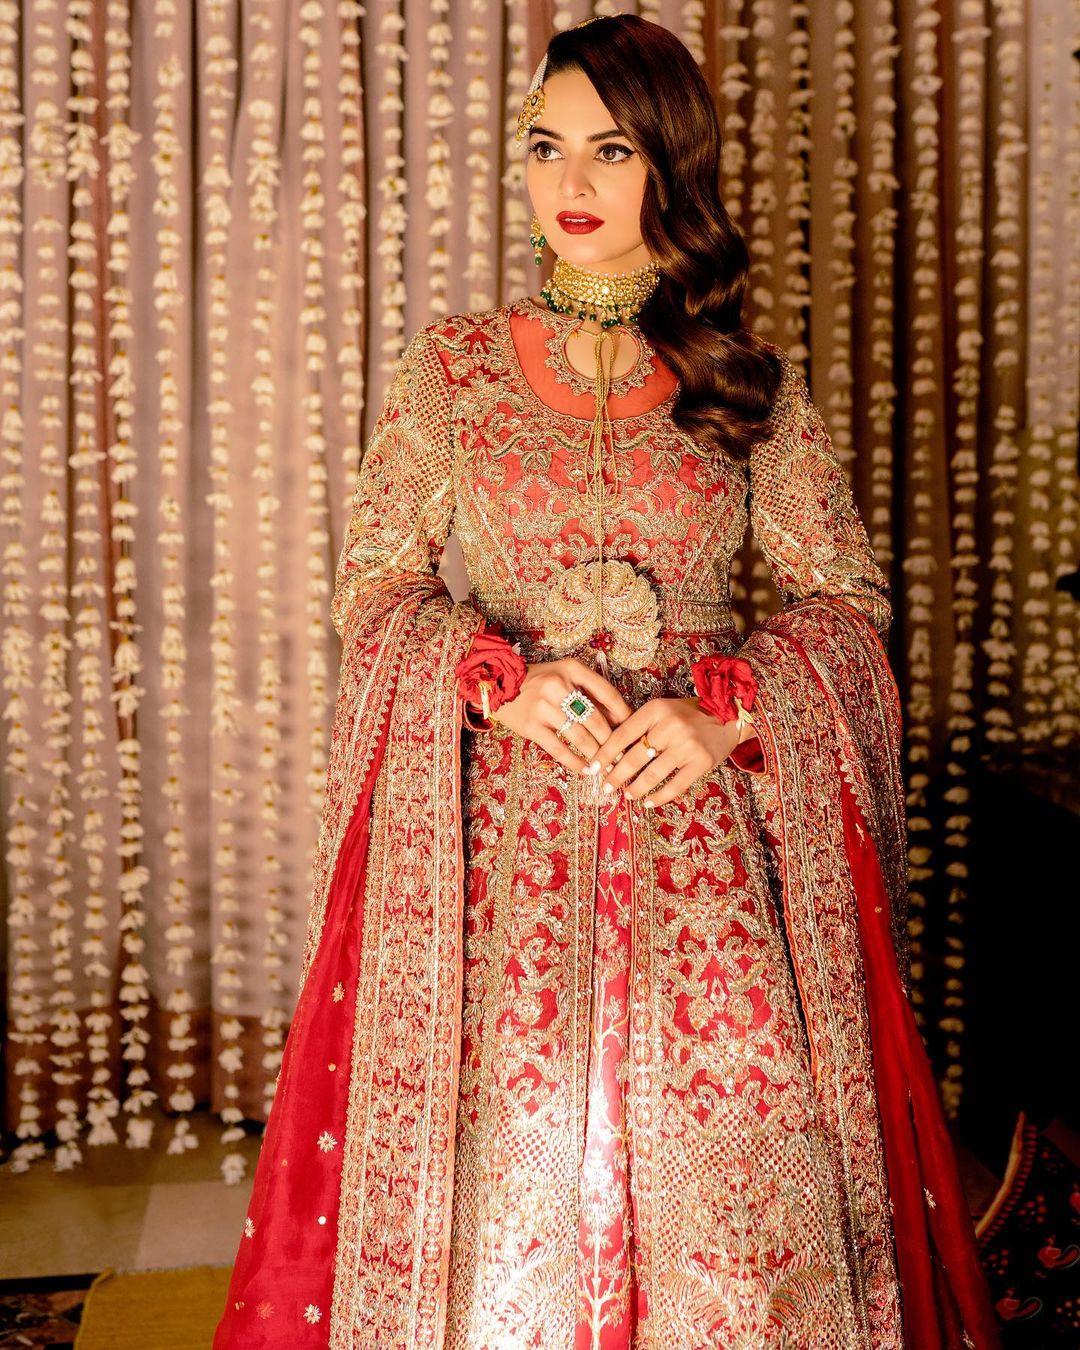 Minal Khan Bridal Photo Shoot for Hussain Rehar